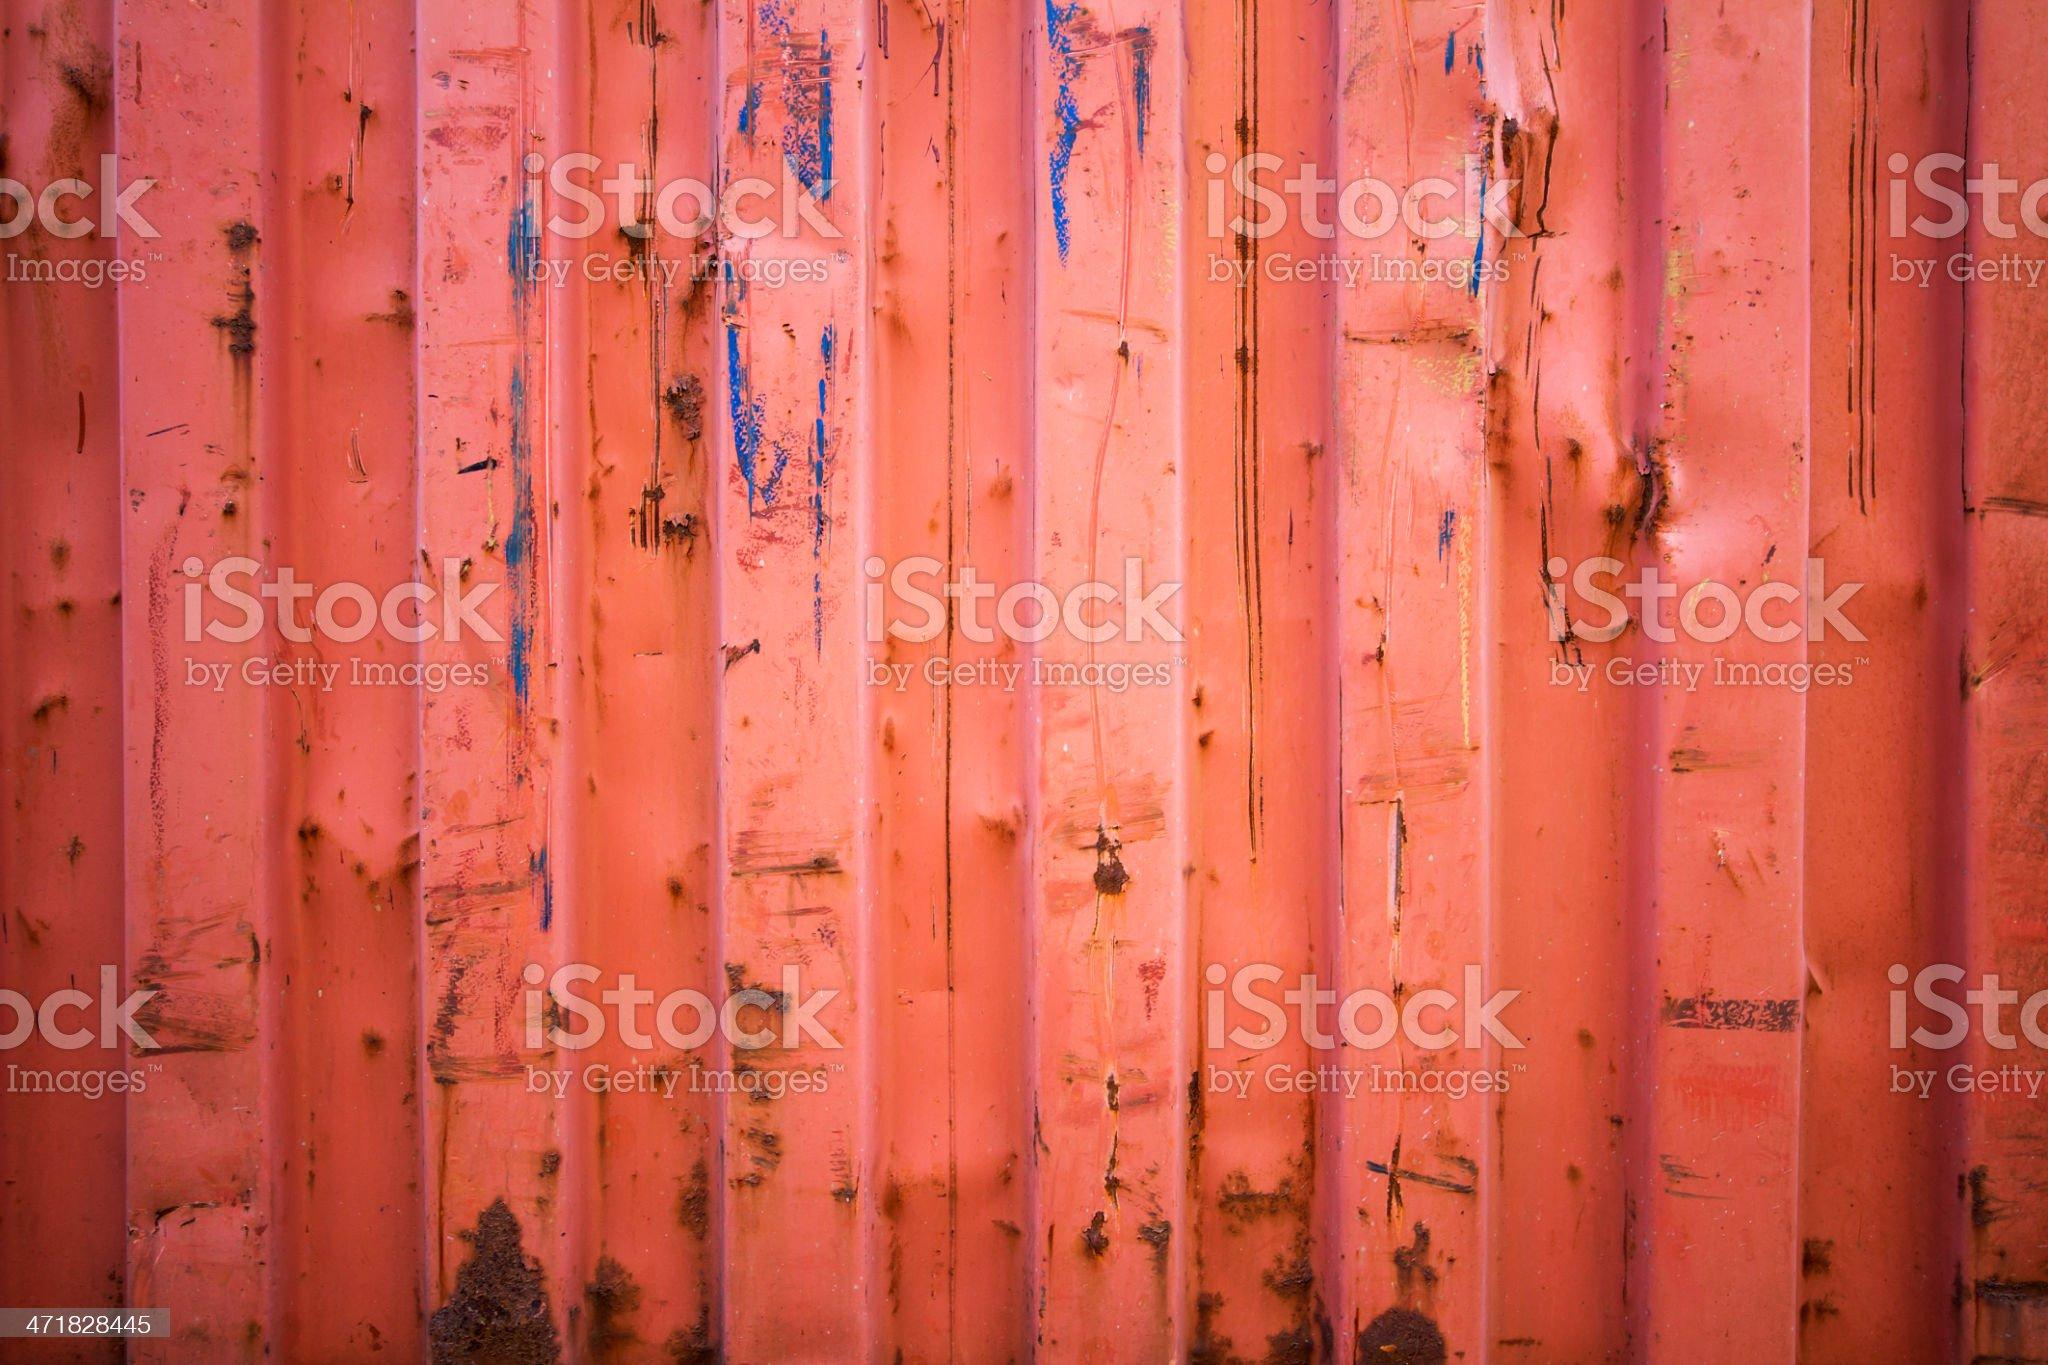 Rusty old corrugated iron royalty-free stock photo